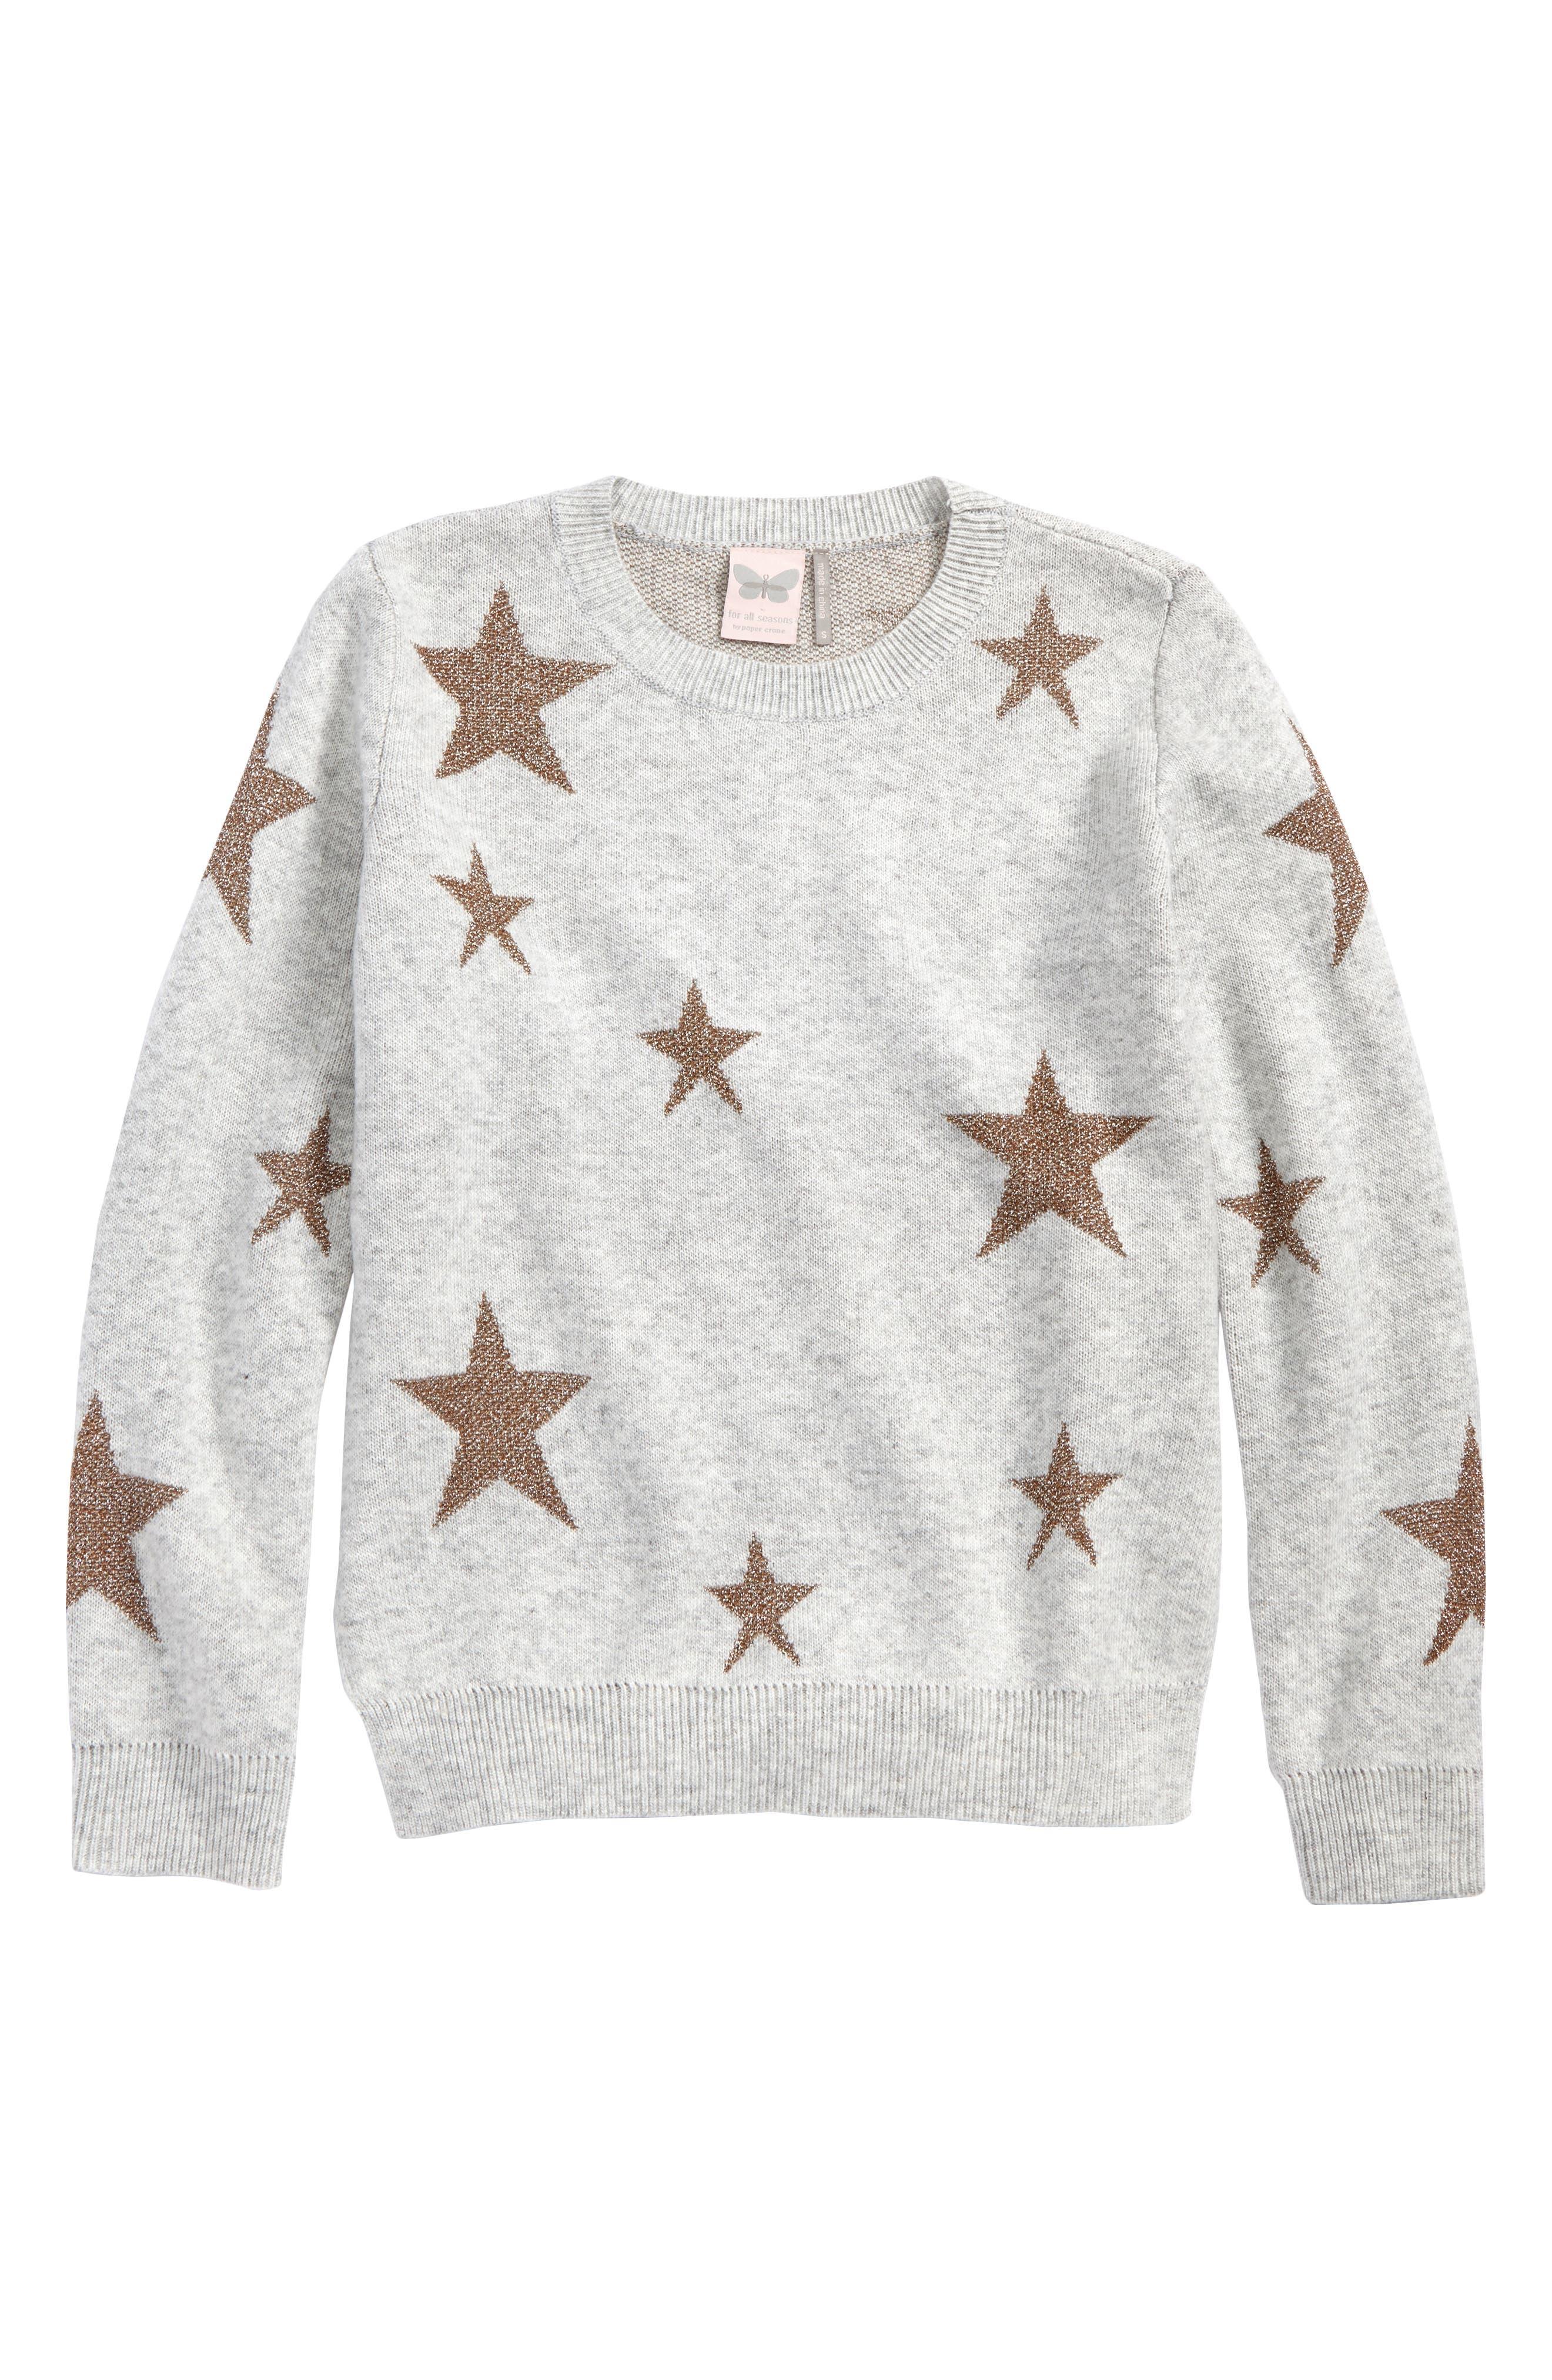 Star Sweater,                             Main thumbnail 1, color,                             020